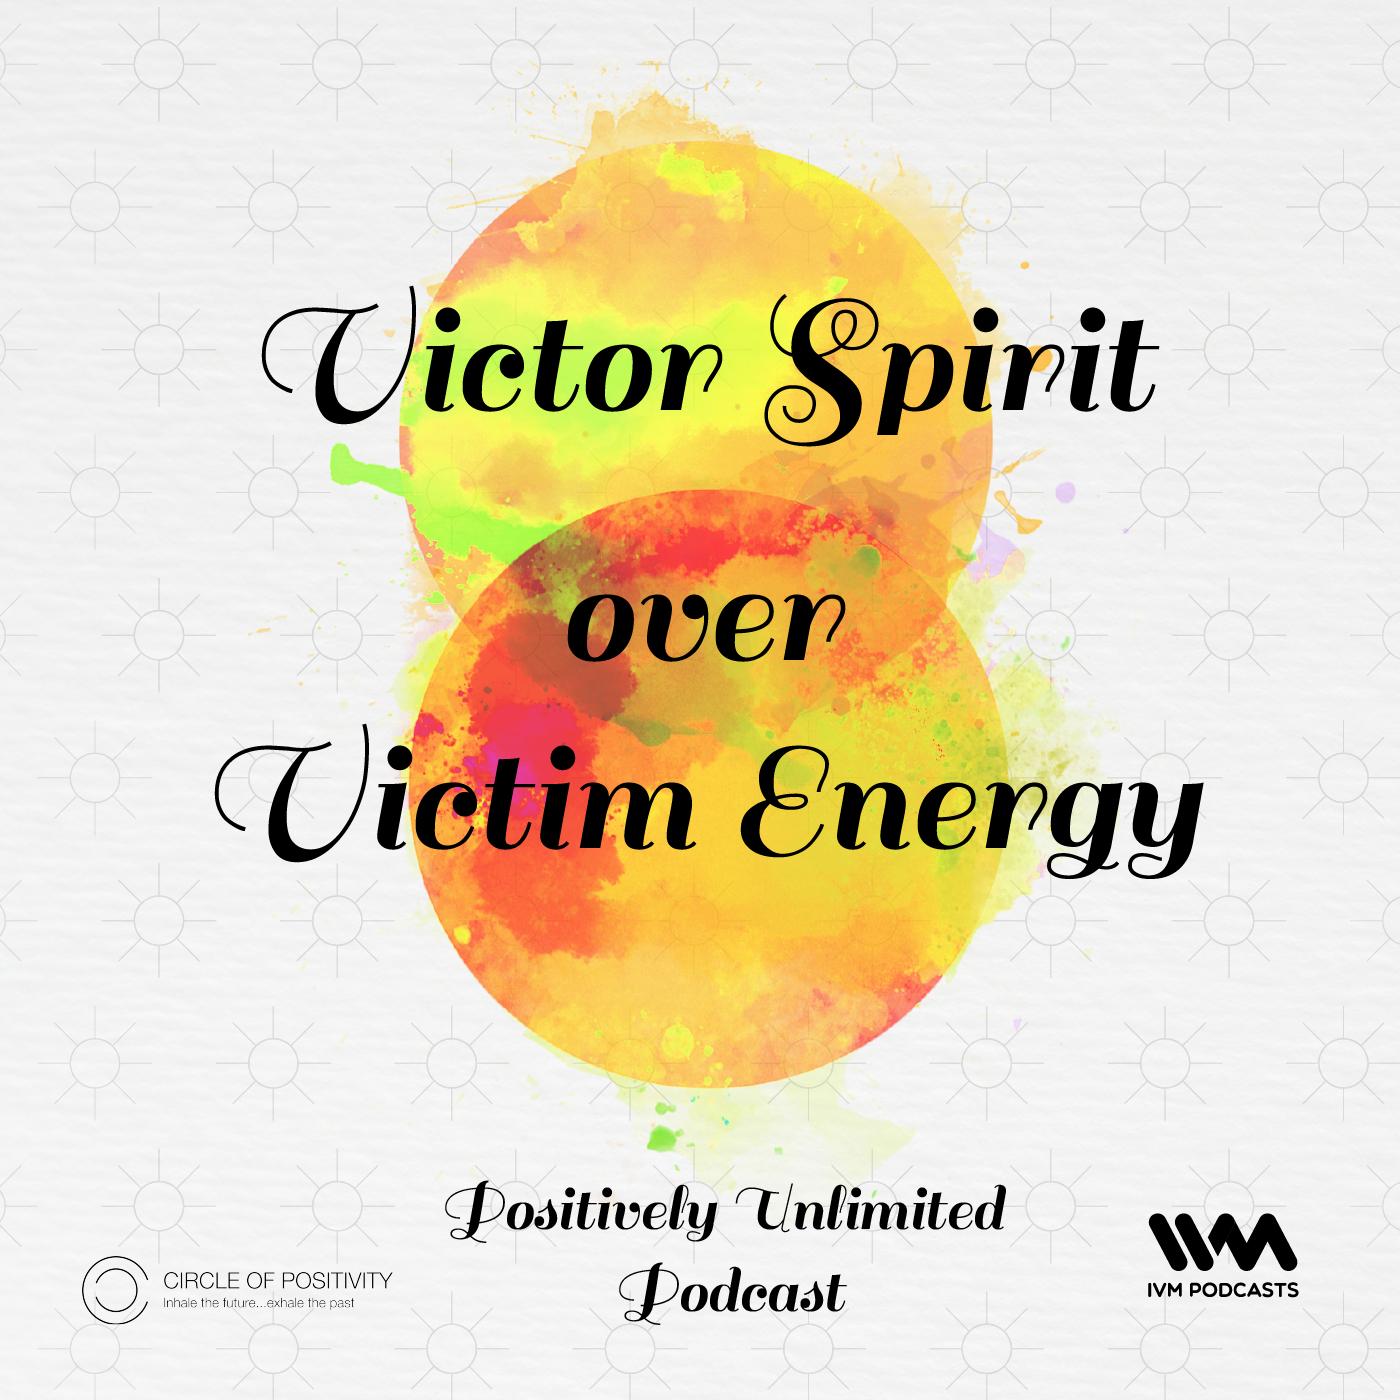 Ep. 49: Victor Spirit over Victim Energy